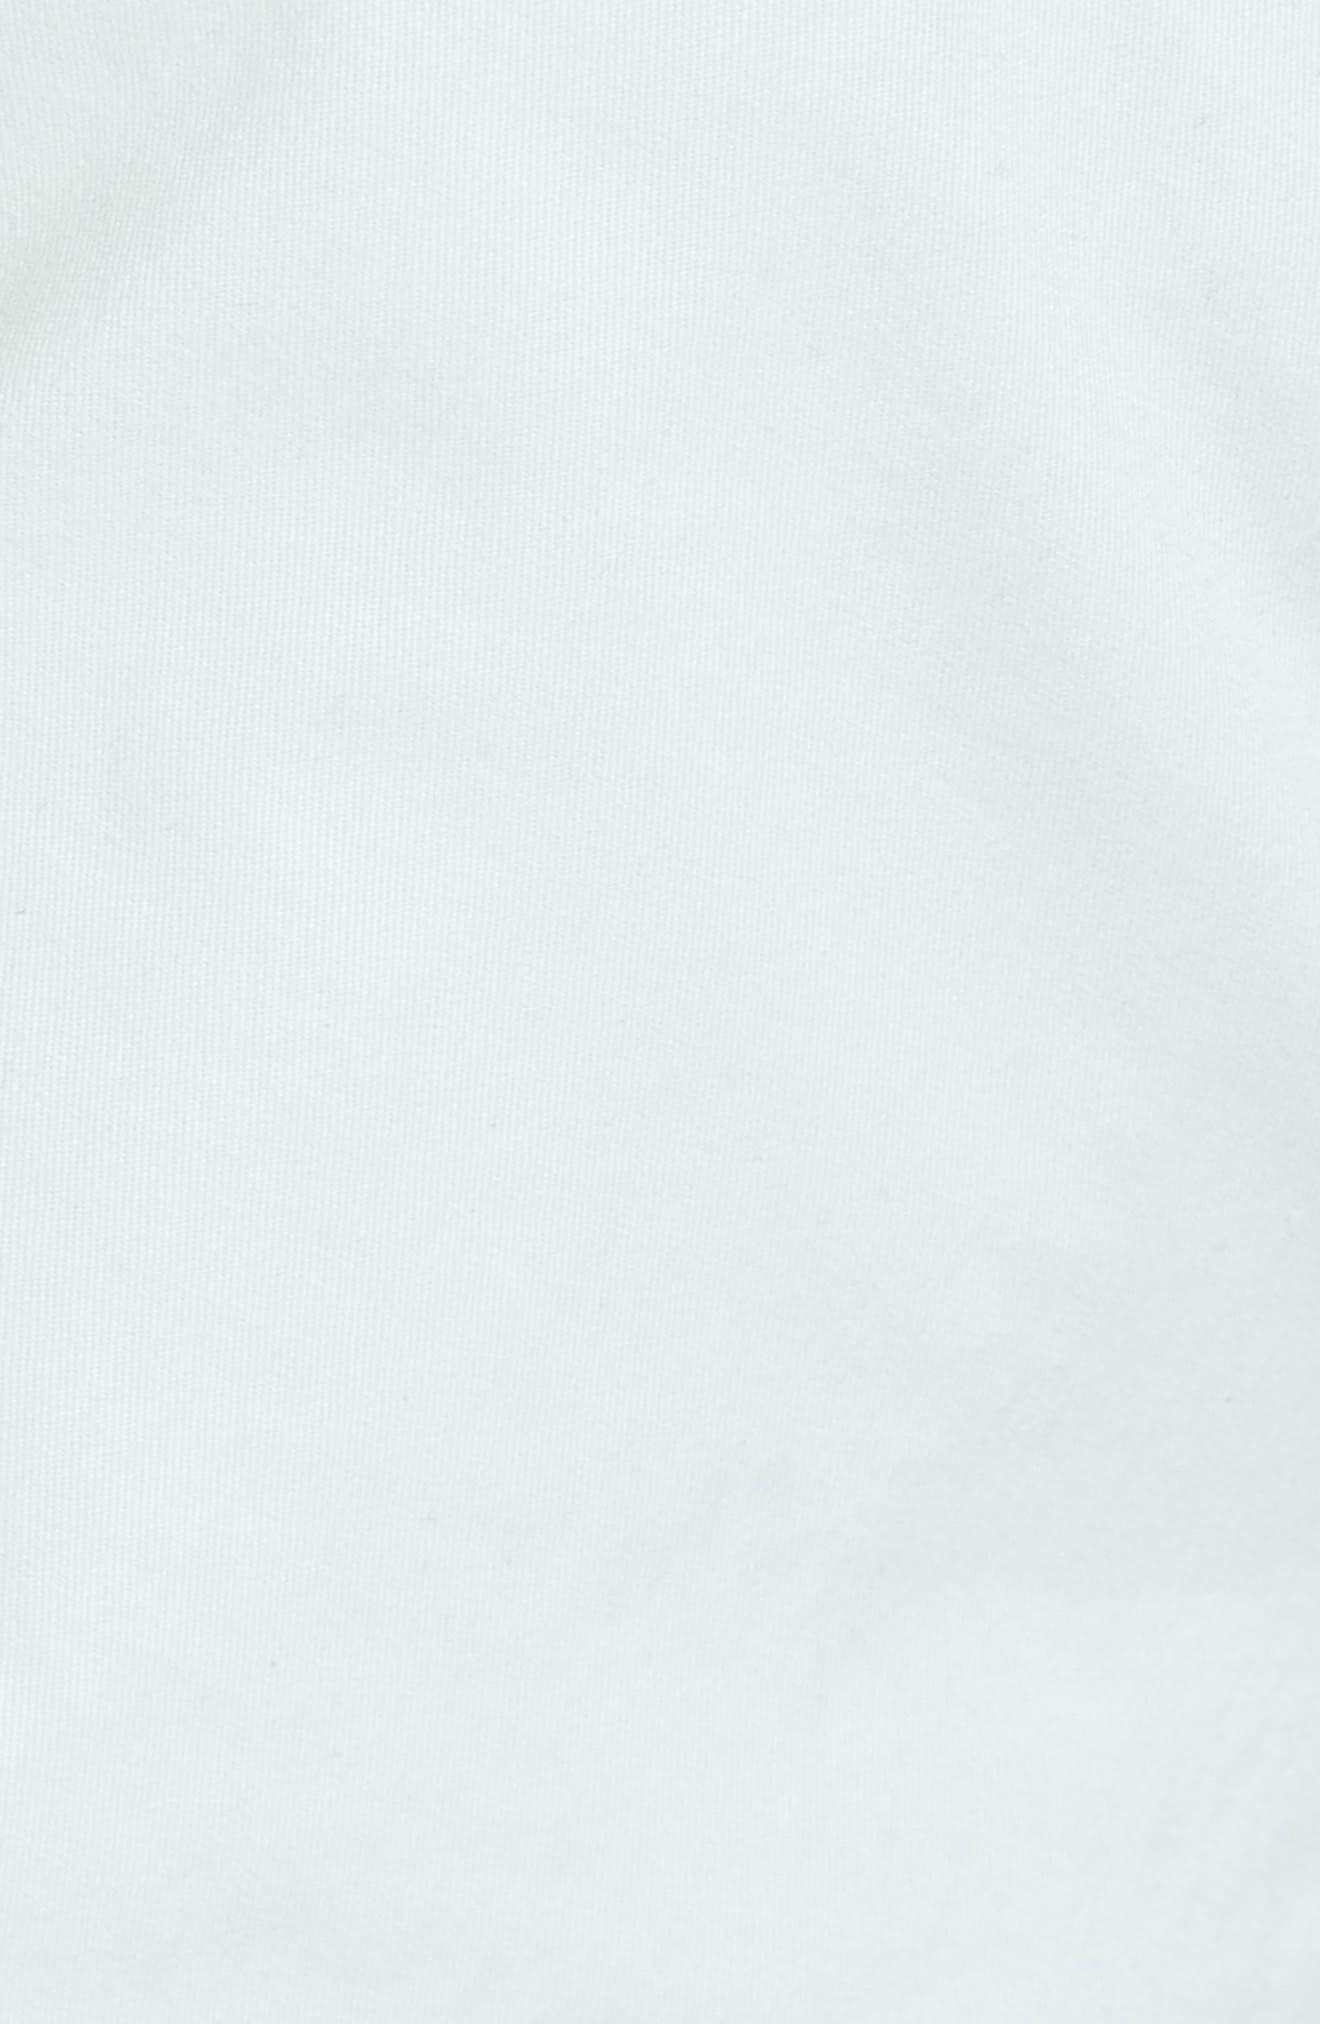 Ballard Slim Fit Stretch Chino 7-Inch Shorts,                             Alternate thumbnail 56, color,